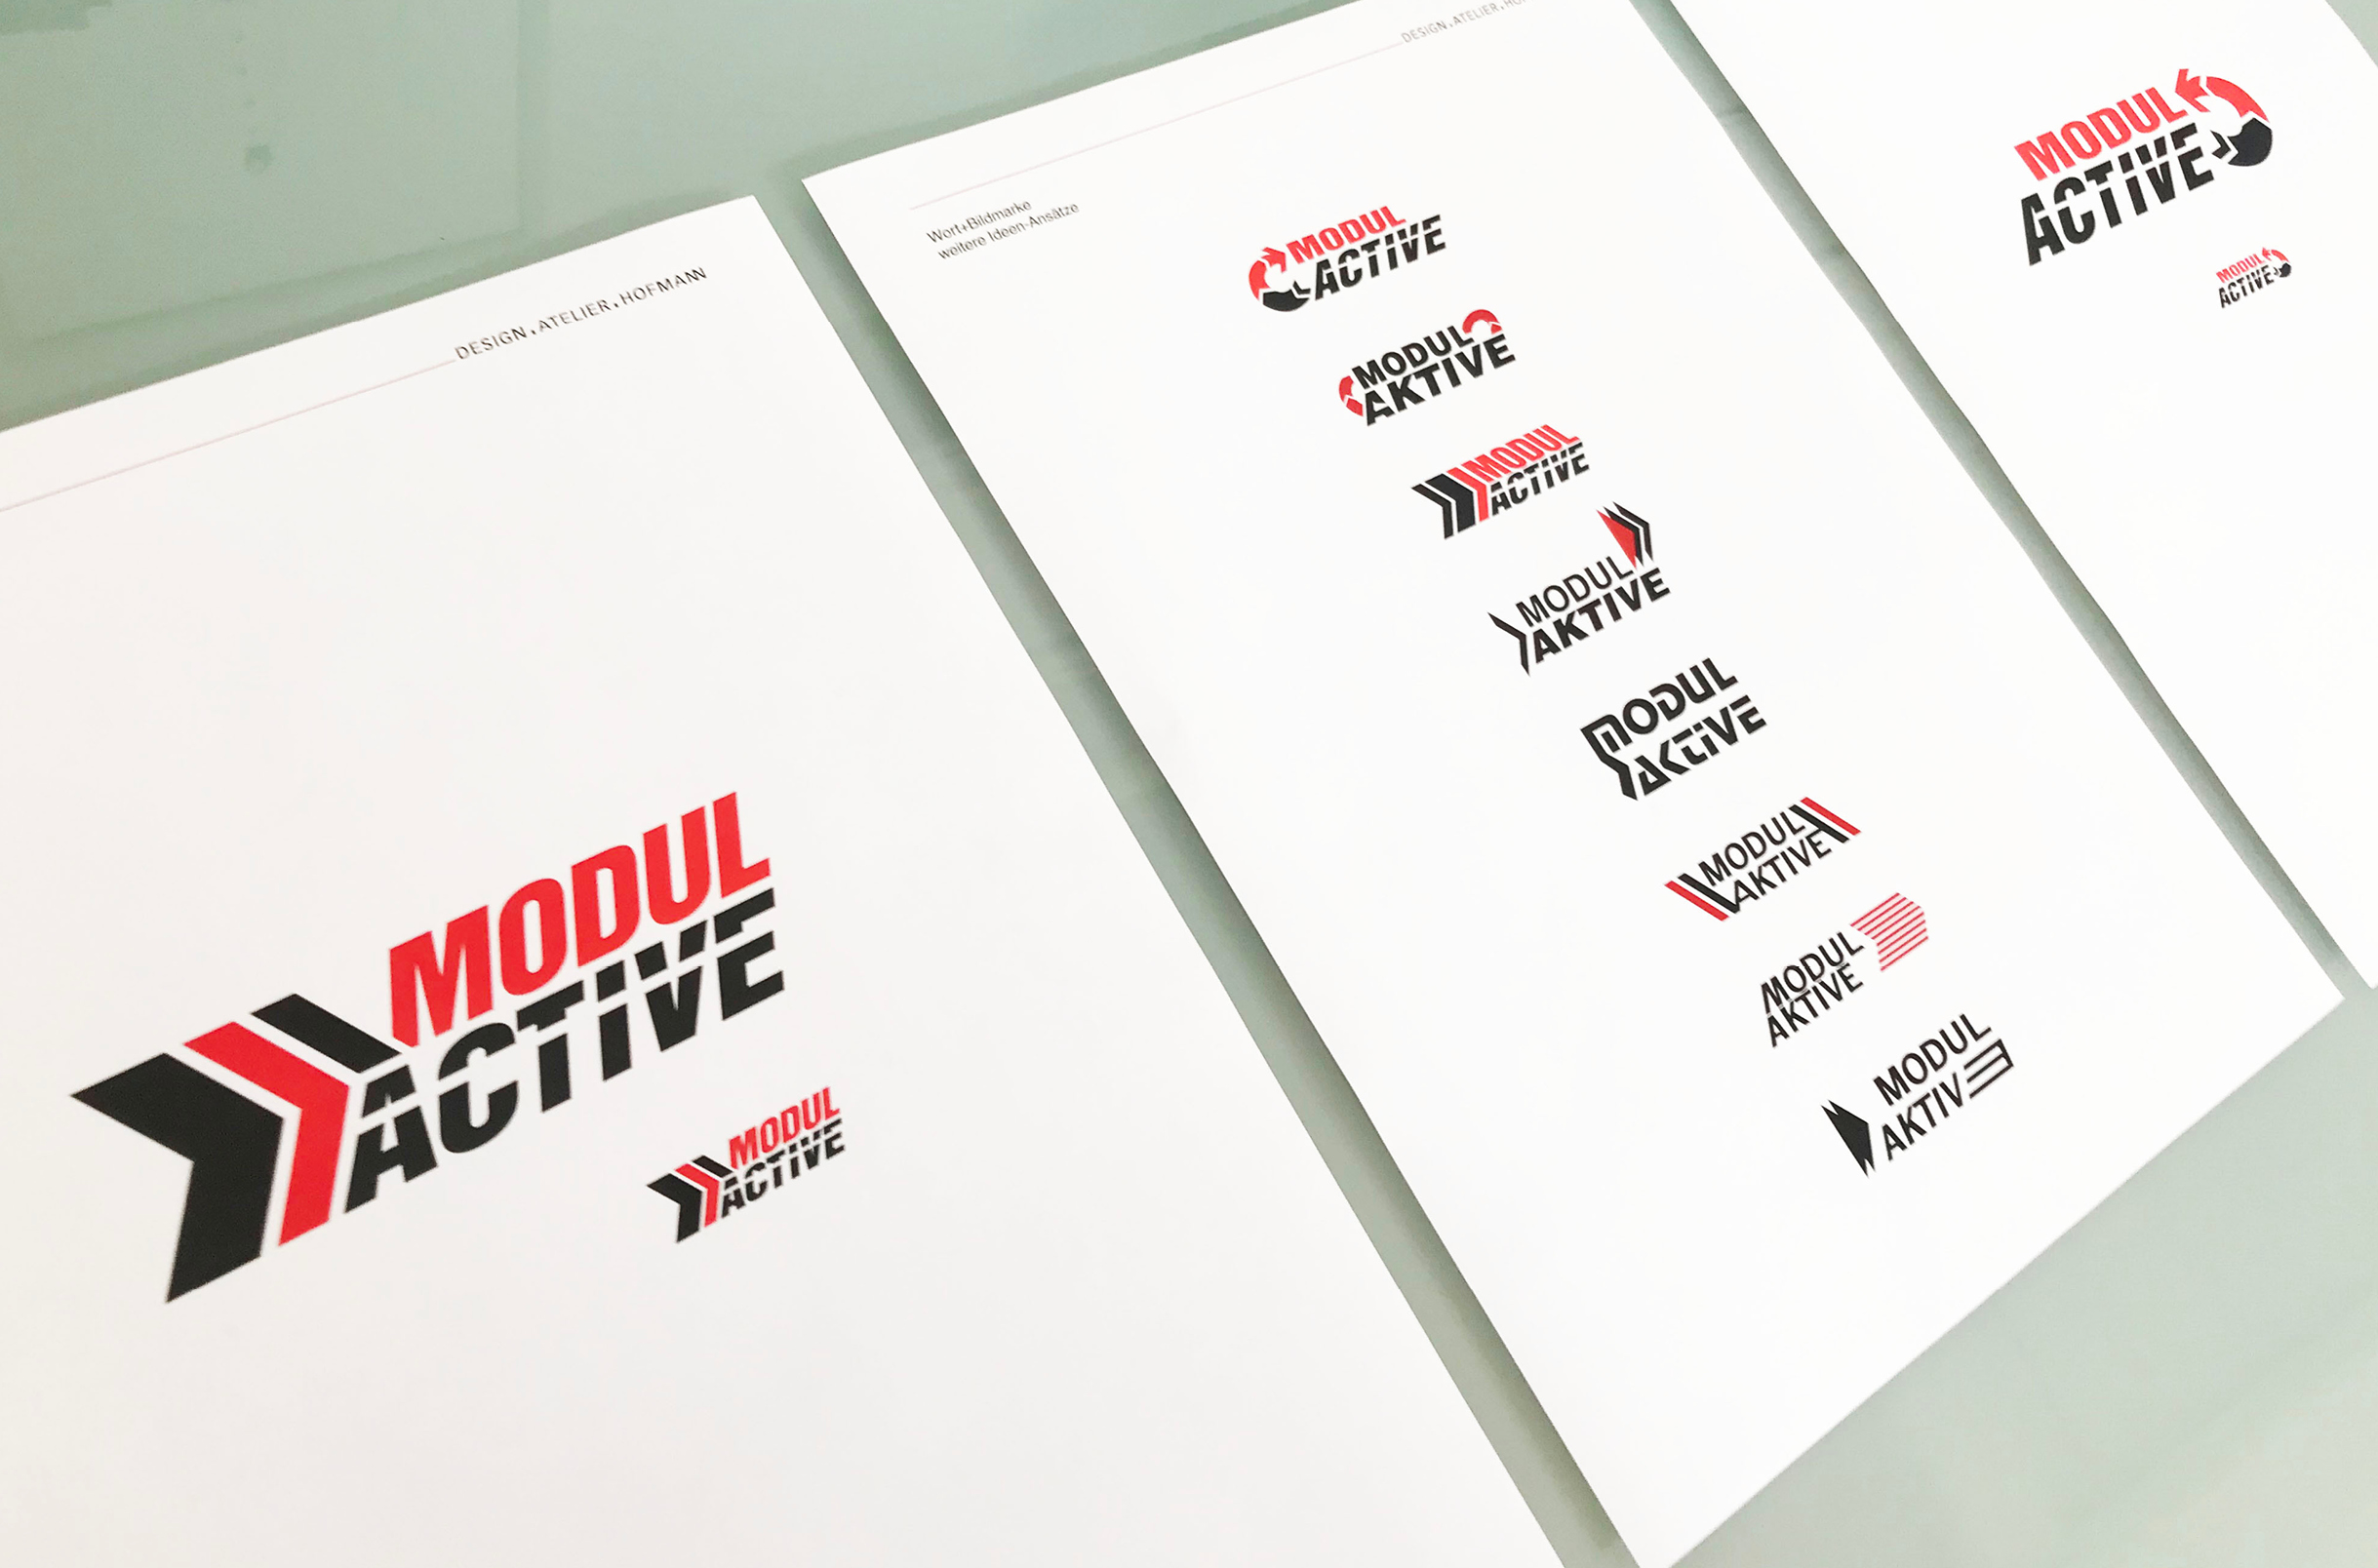 Stadler Motorradbekleidung – neue Produktline erhält einprägsames Logo